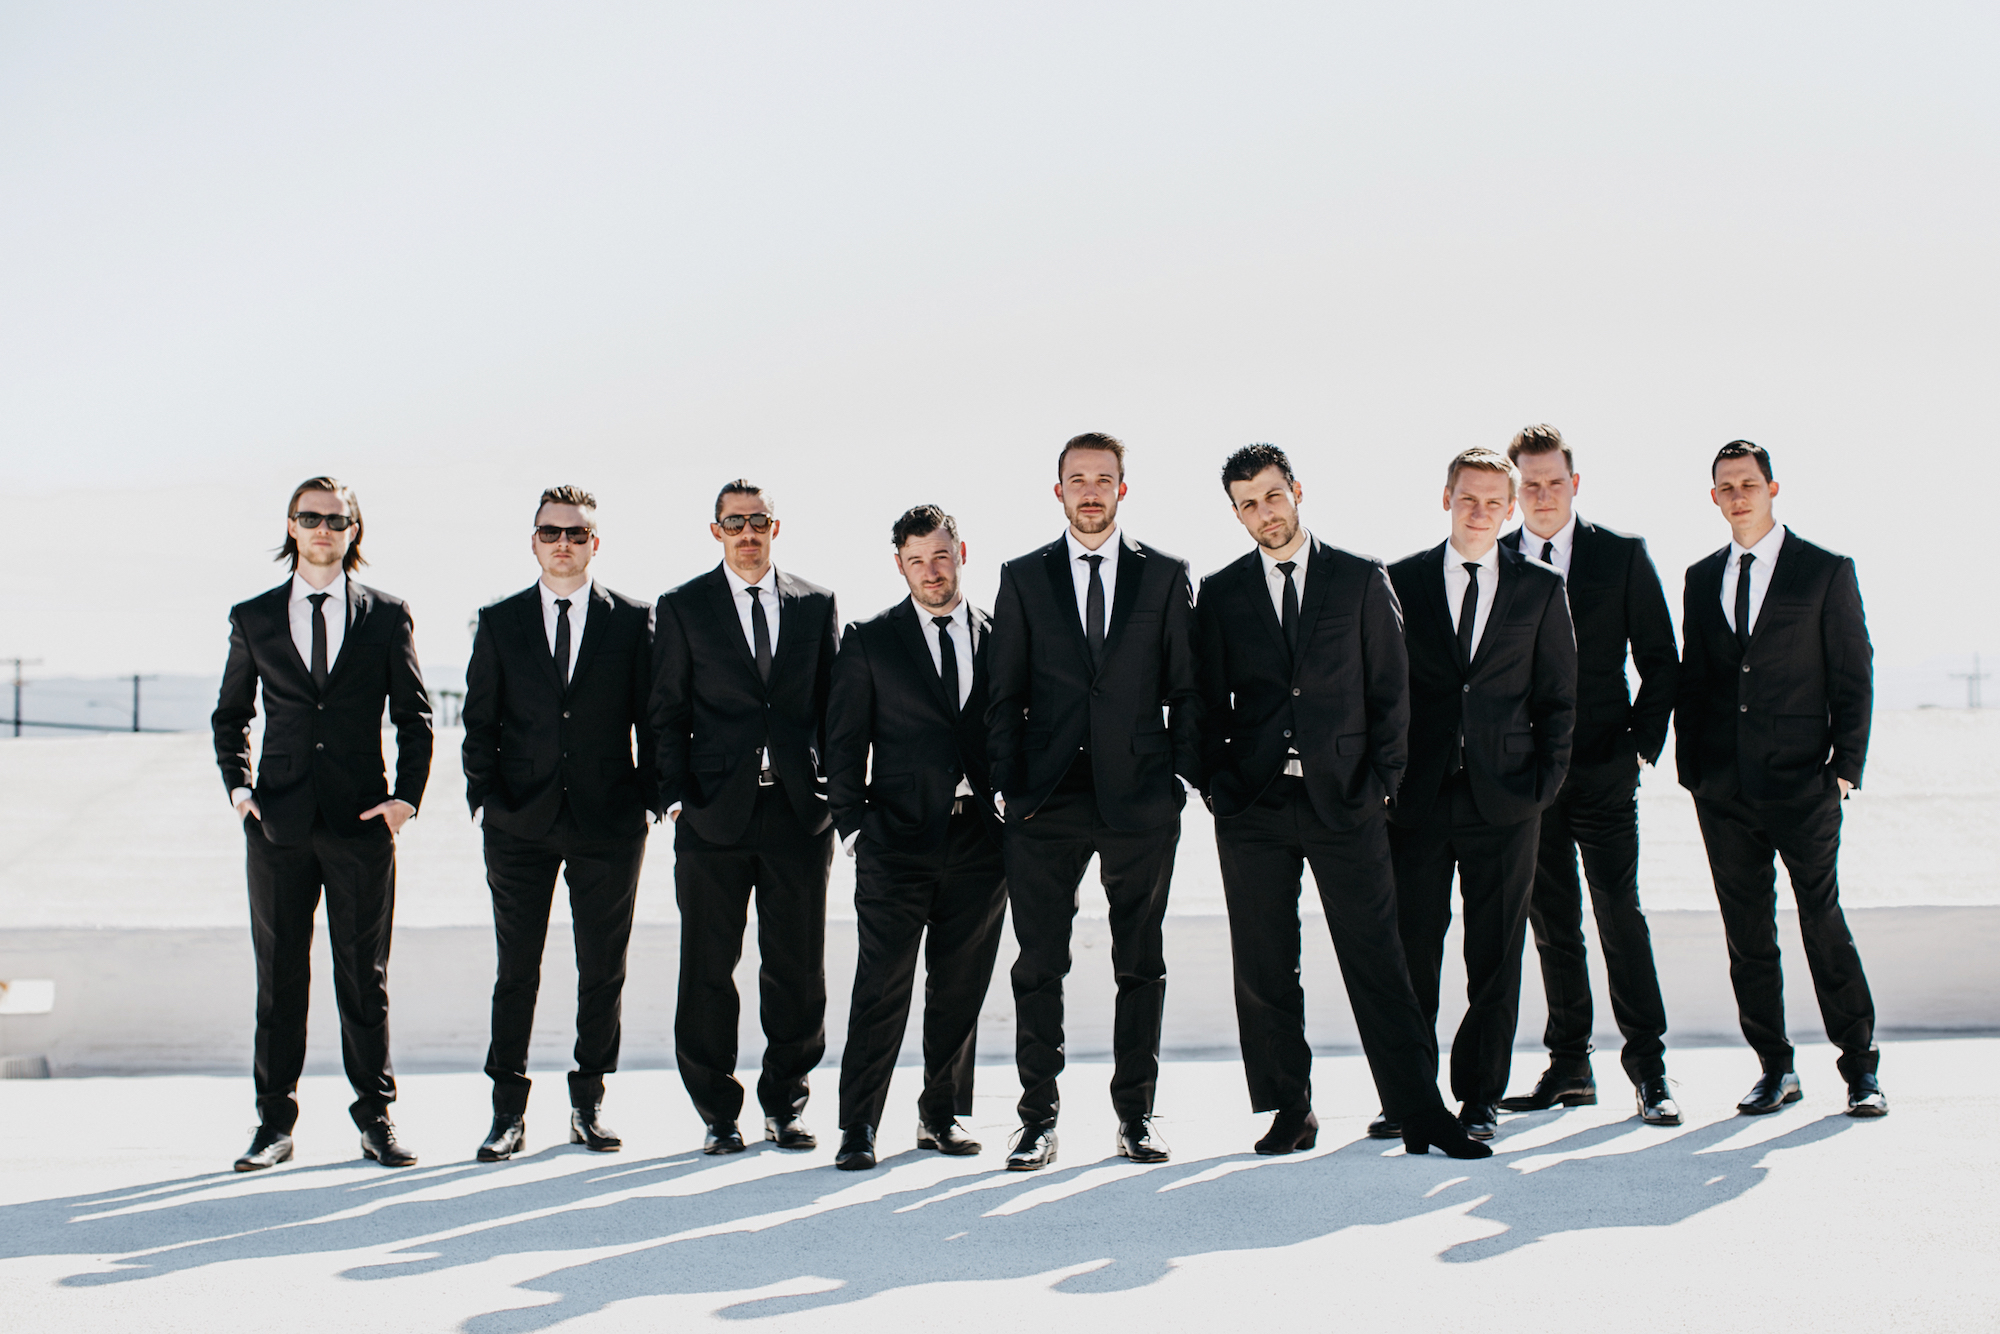 arizona - wedding - photographer 088.jpg